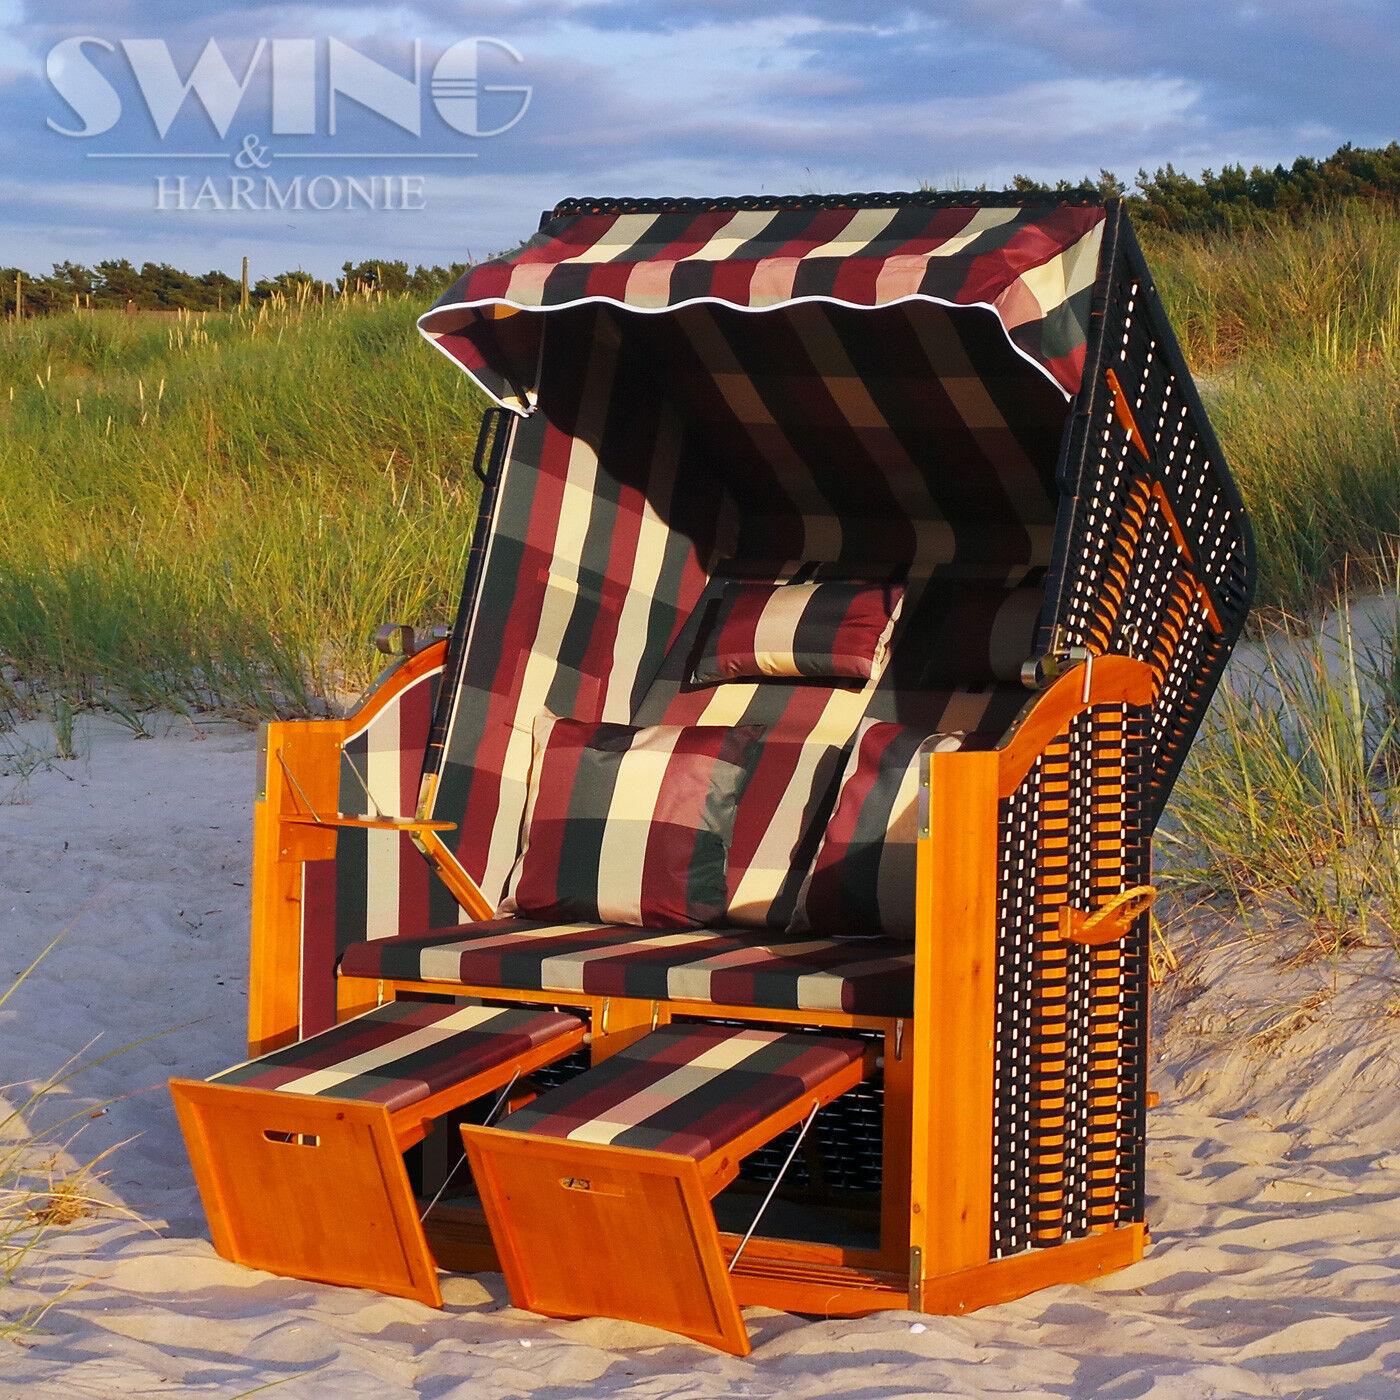 Jugara de lujo cesta XXL Mar Báltico volllieger tumbona rojoonda de ratán con parasol muebles tumbona de jardín